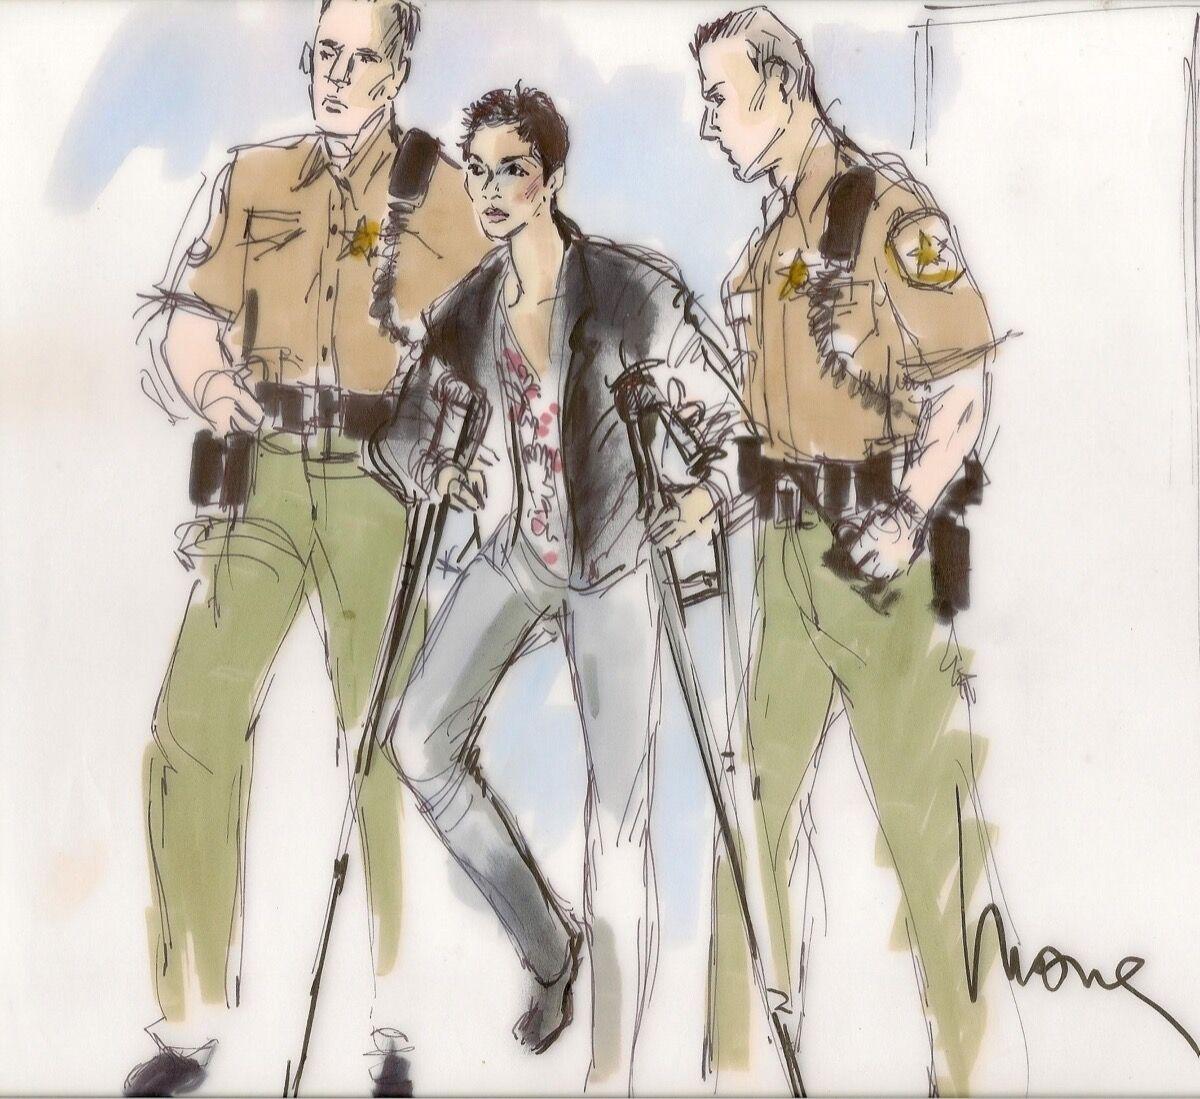 Illustration of Halle Berry by Mona Shafer Edwards.